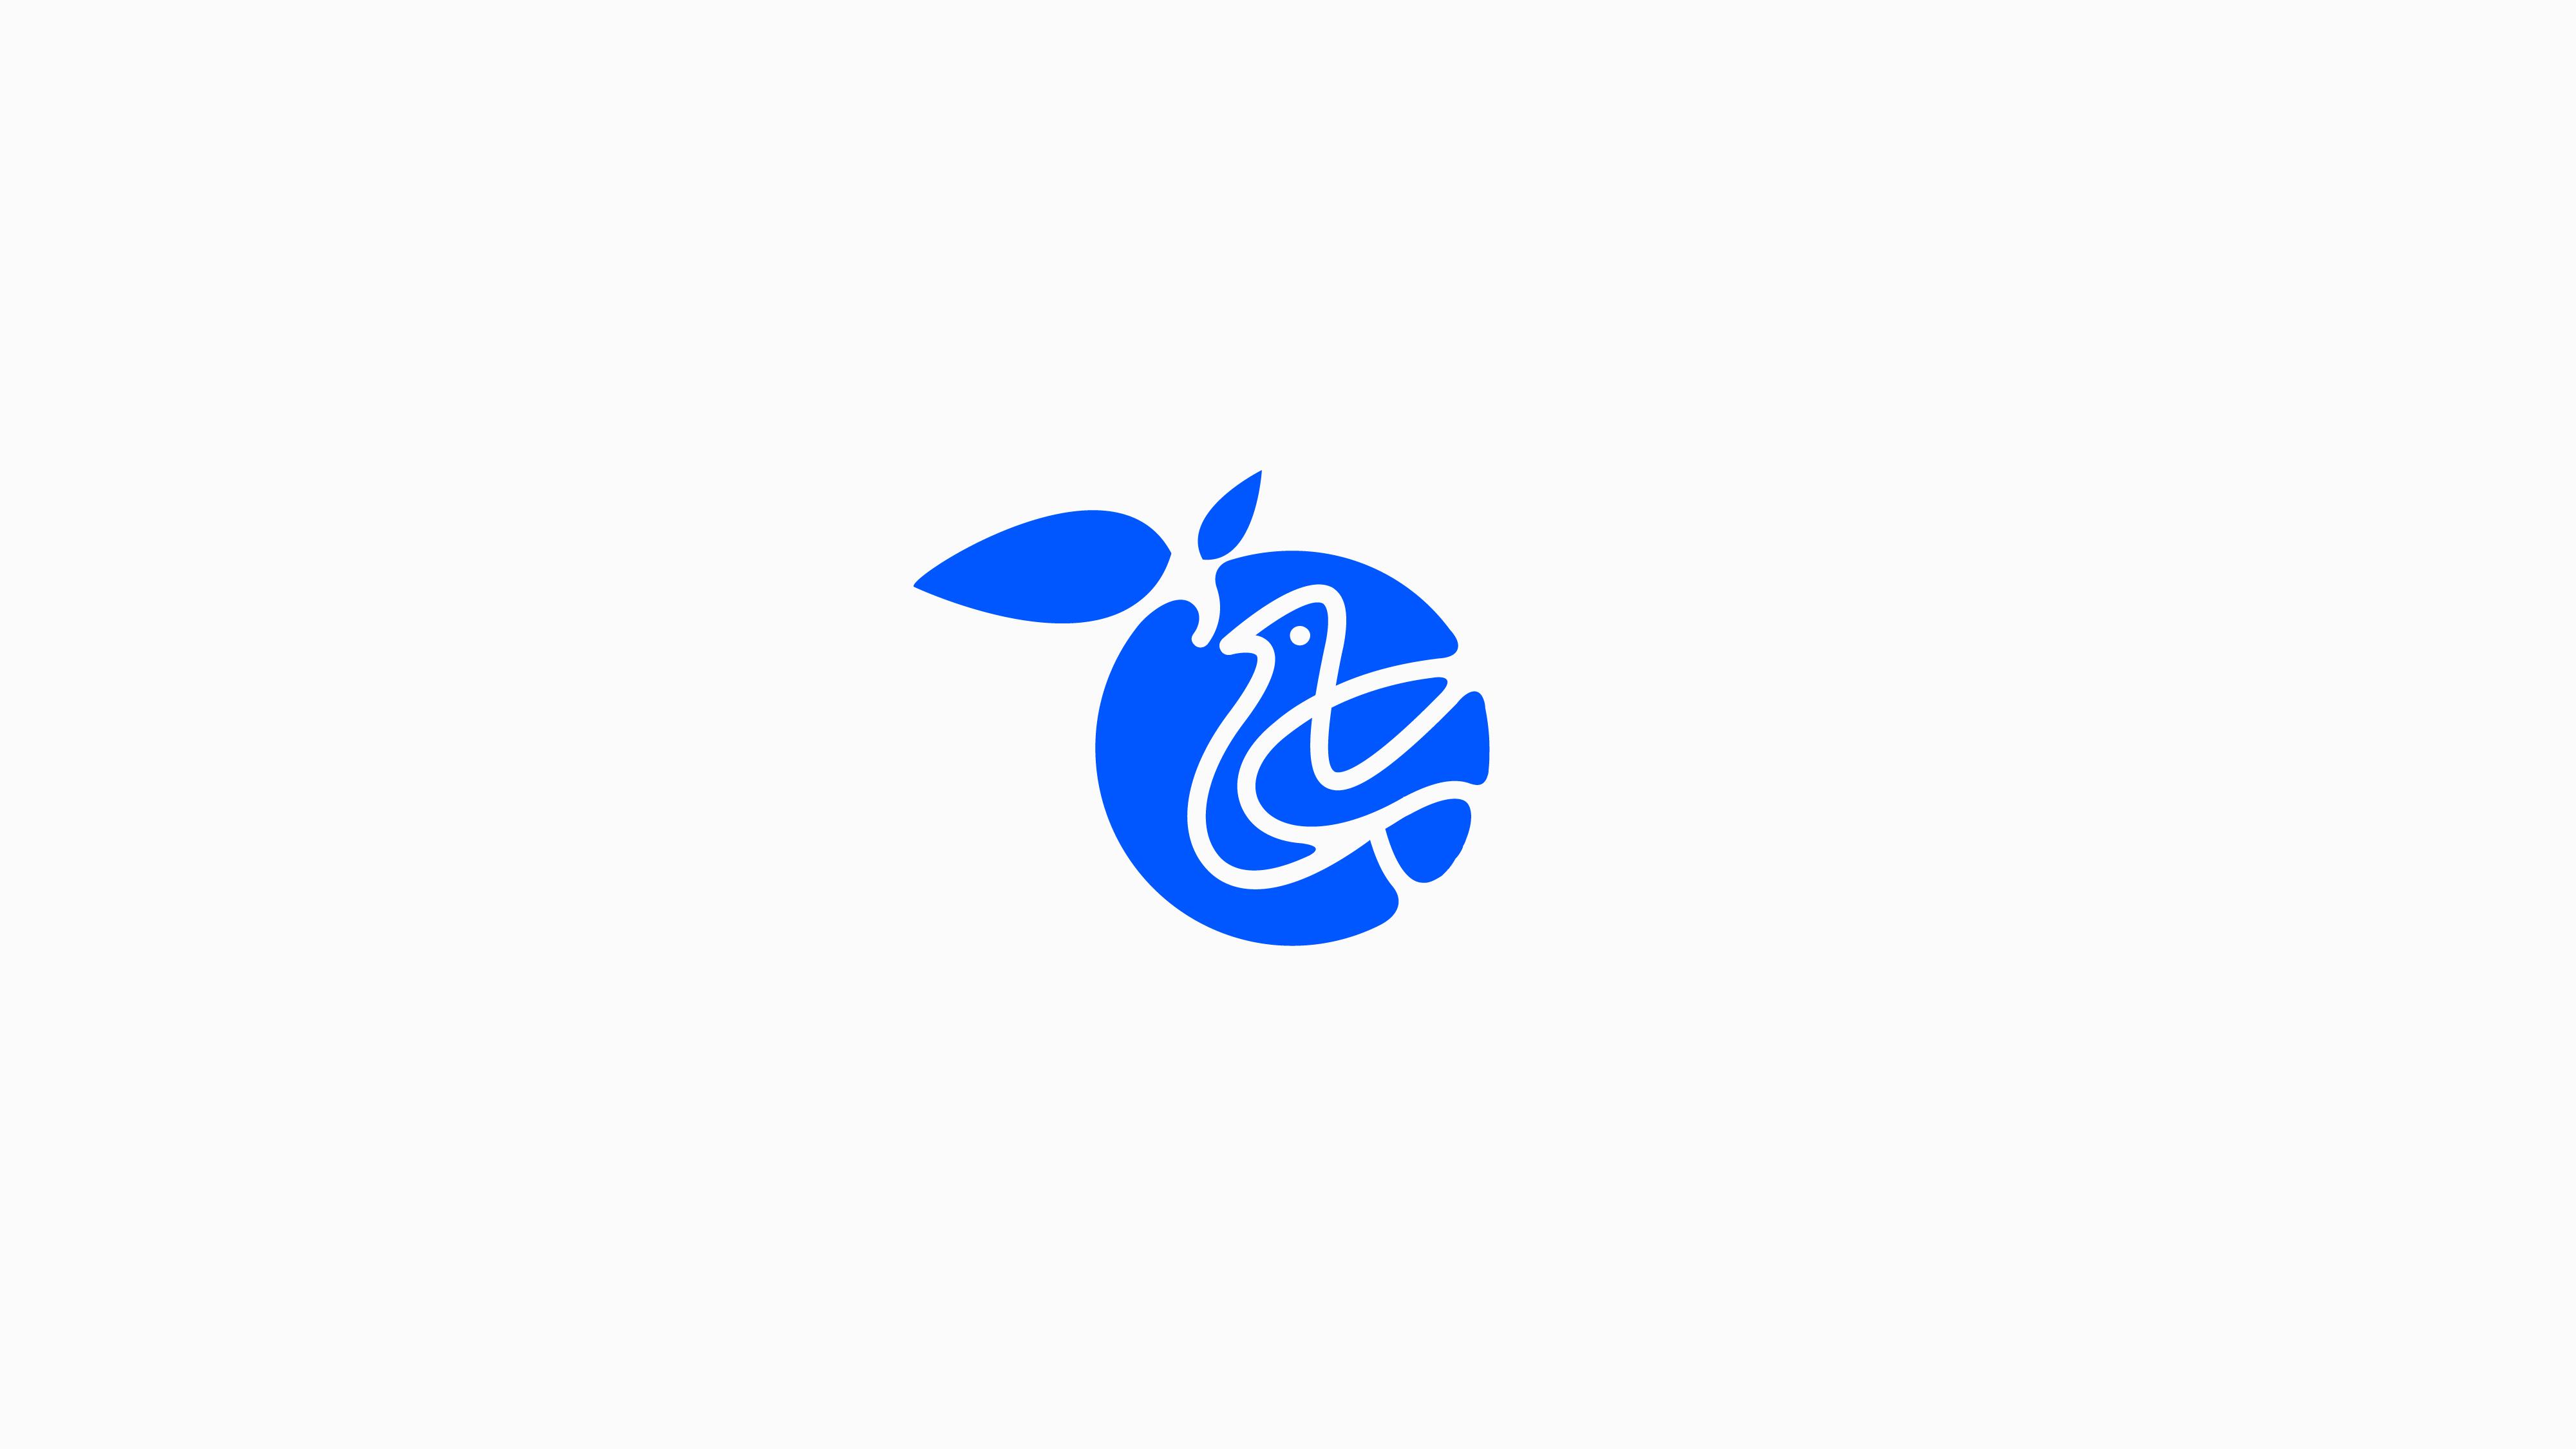 Fruit-Bird-logo-Farm-logo